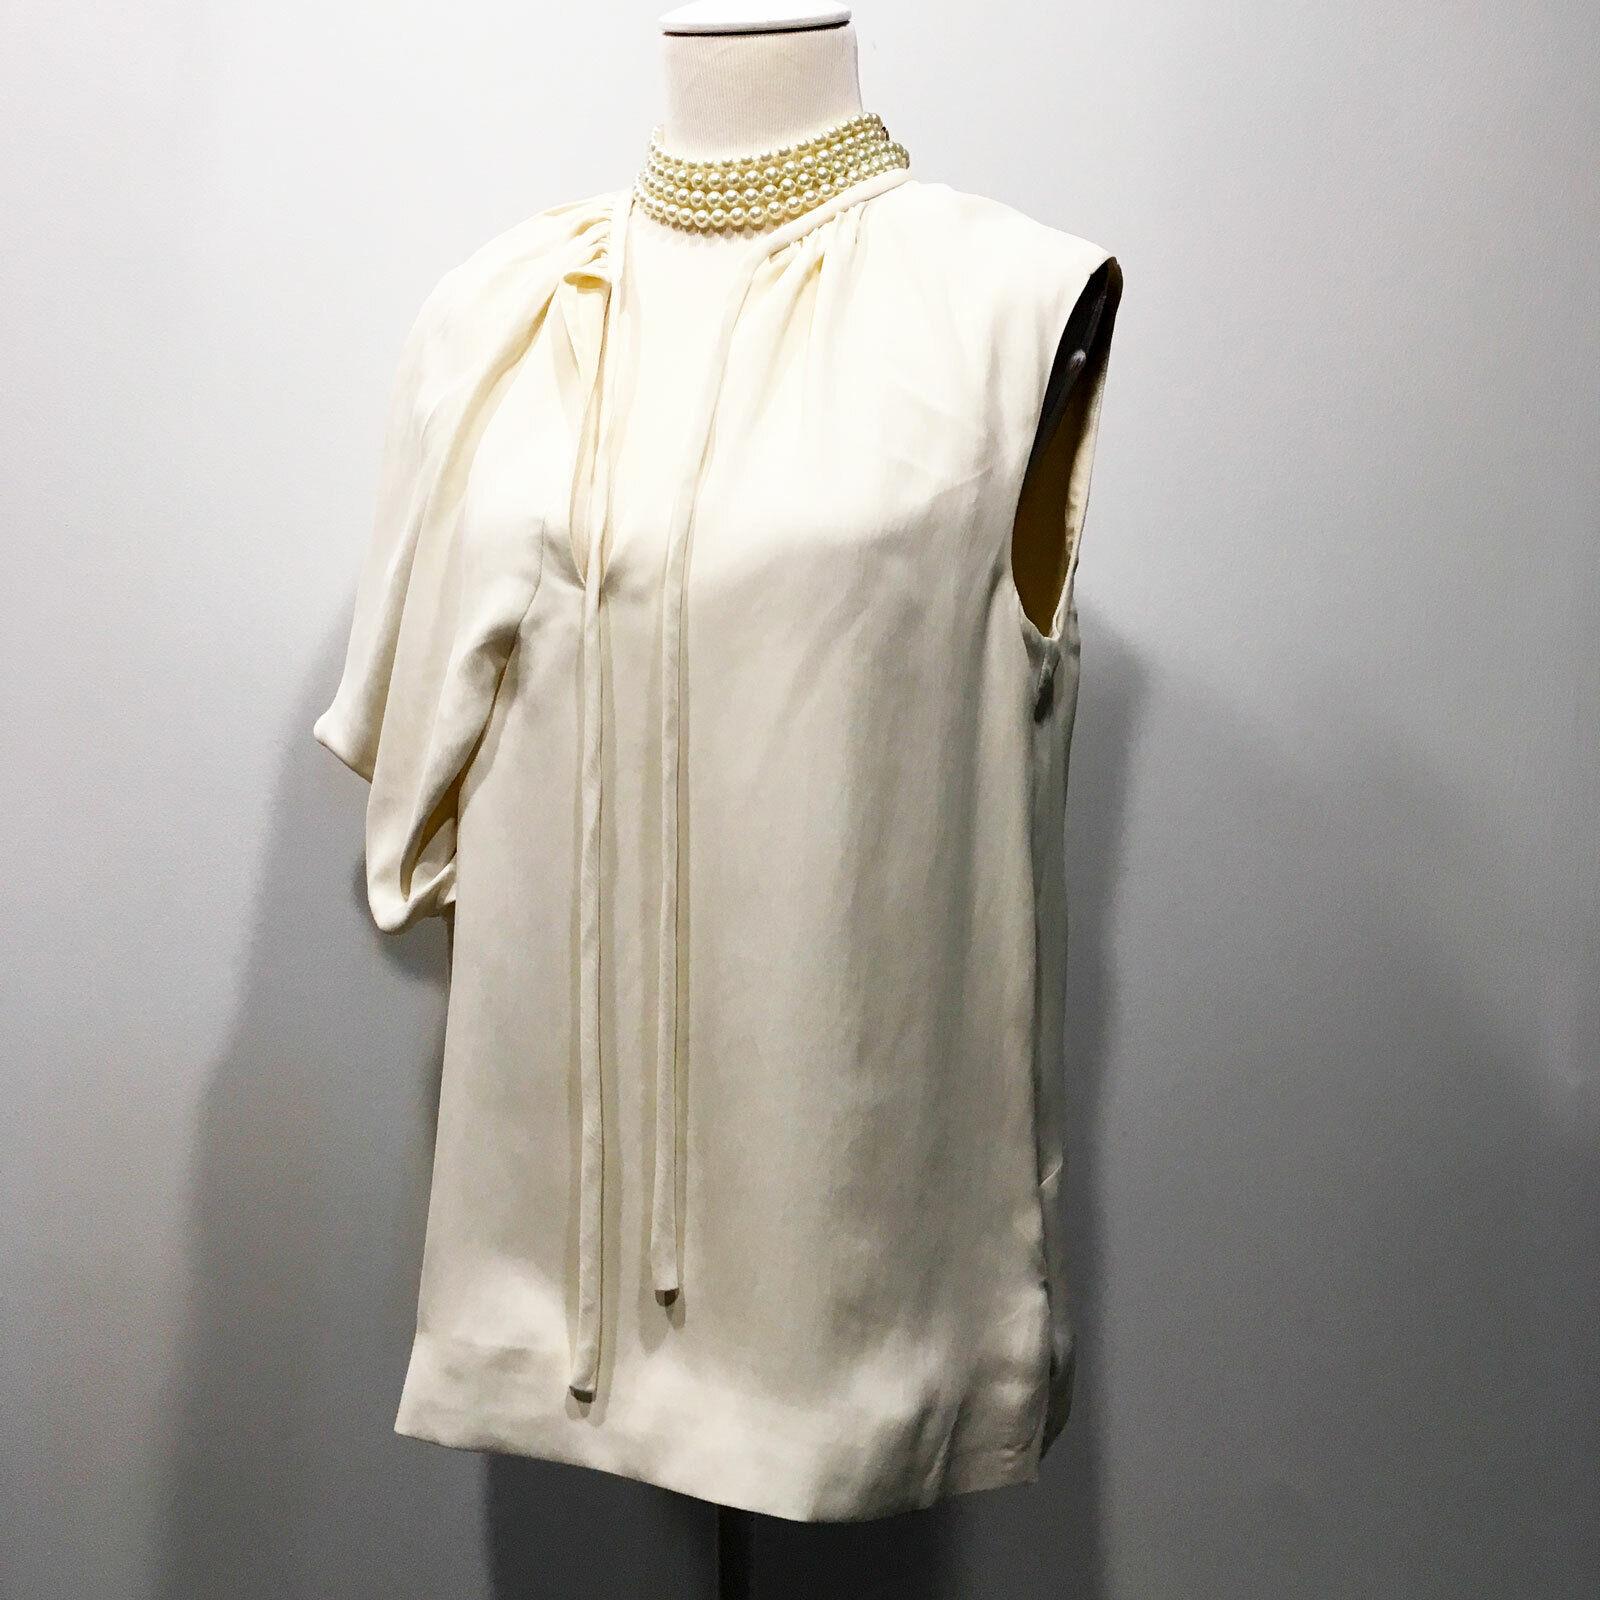 Balenciaga | $945 Ivory One-Shoulder  Pleated Dra… - image 2